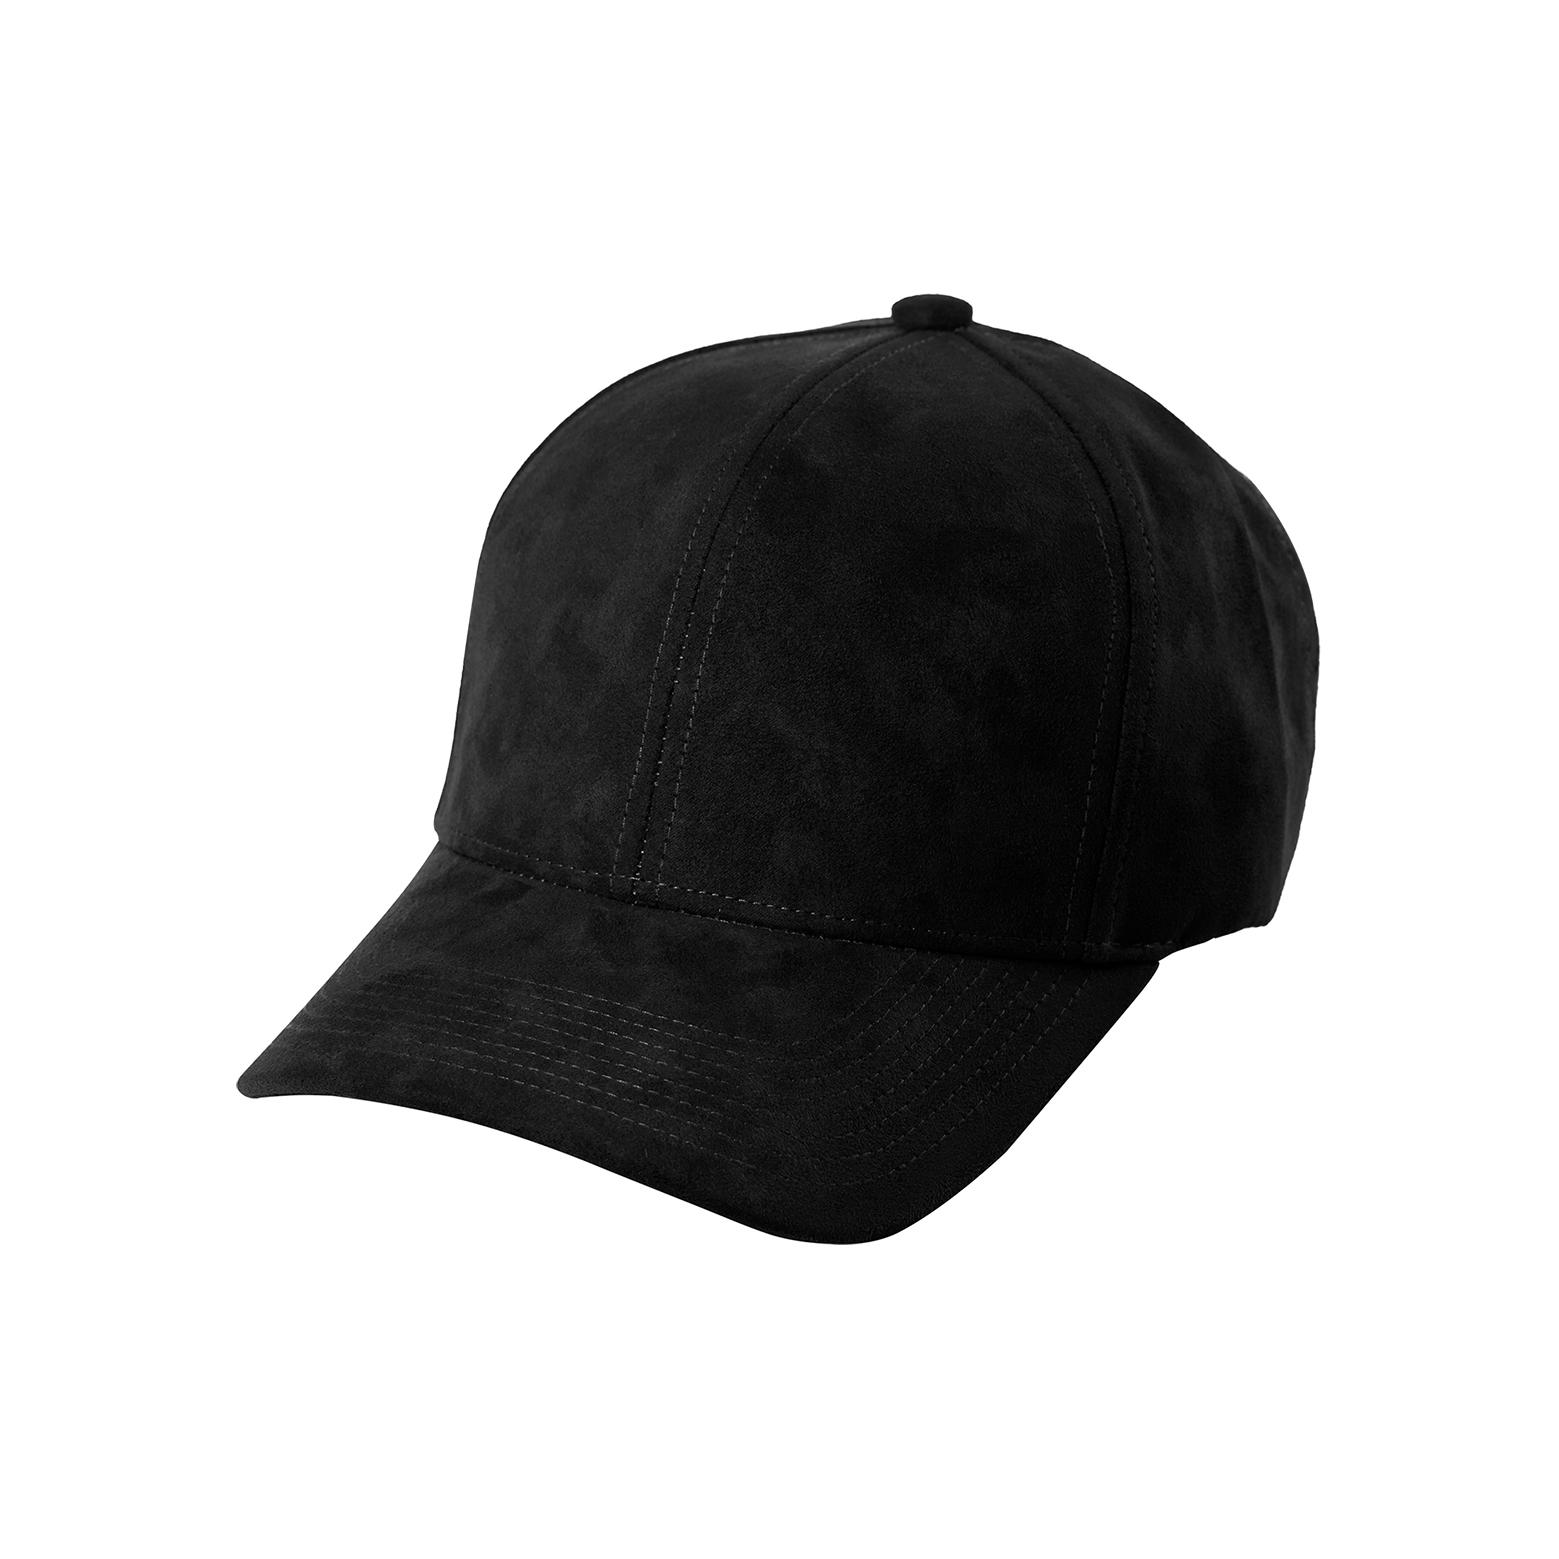 293c43cb47 DSLINE BASEBALL CAP BLACK SUEDE   GOLD - DSLINE BASICS